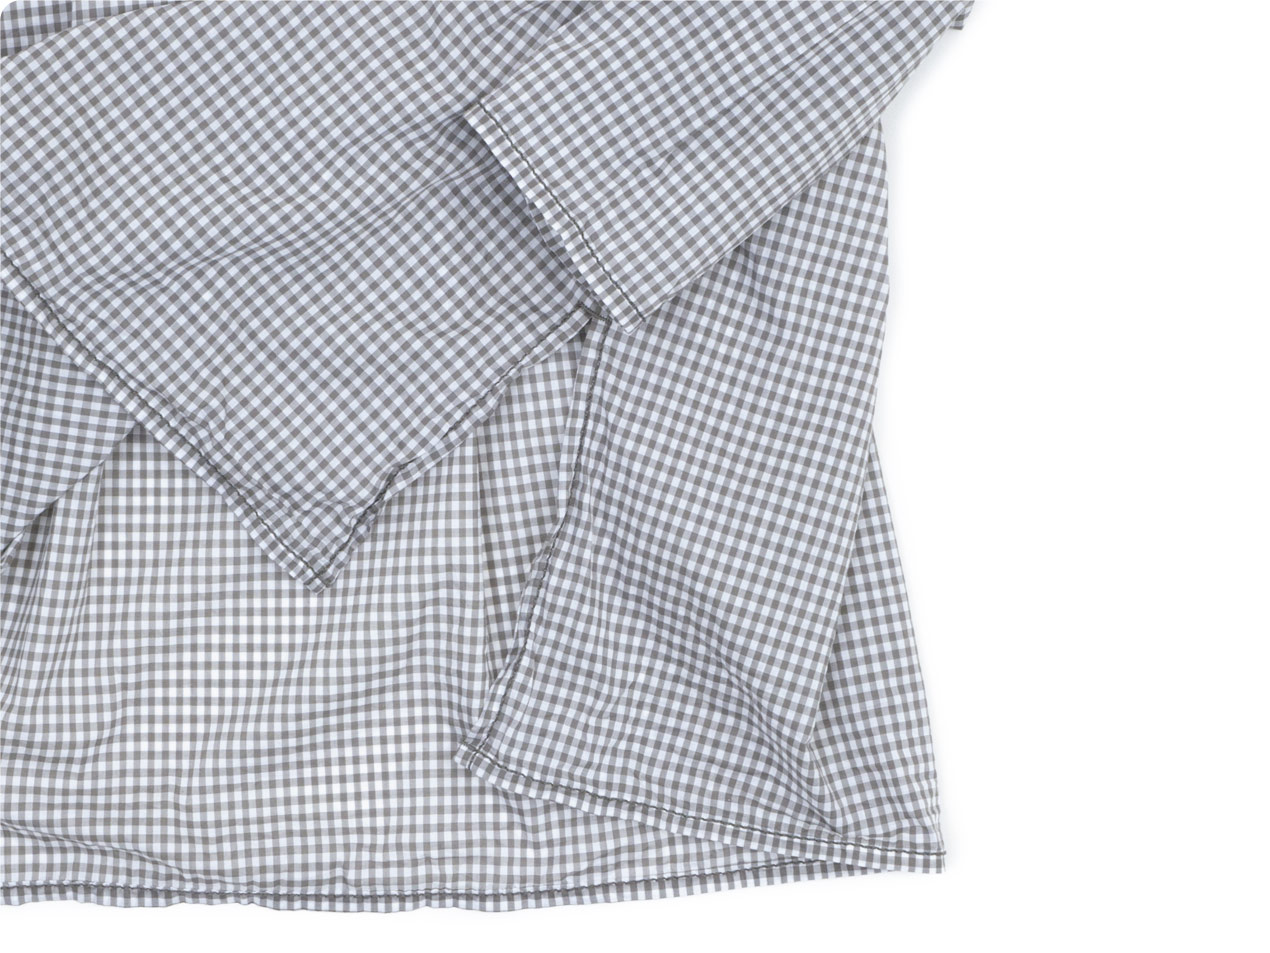 homspun 80/1ギンガム スタンドカラー プルオーバーシャツ